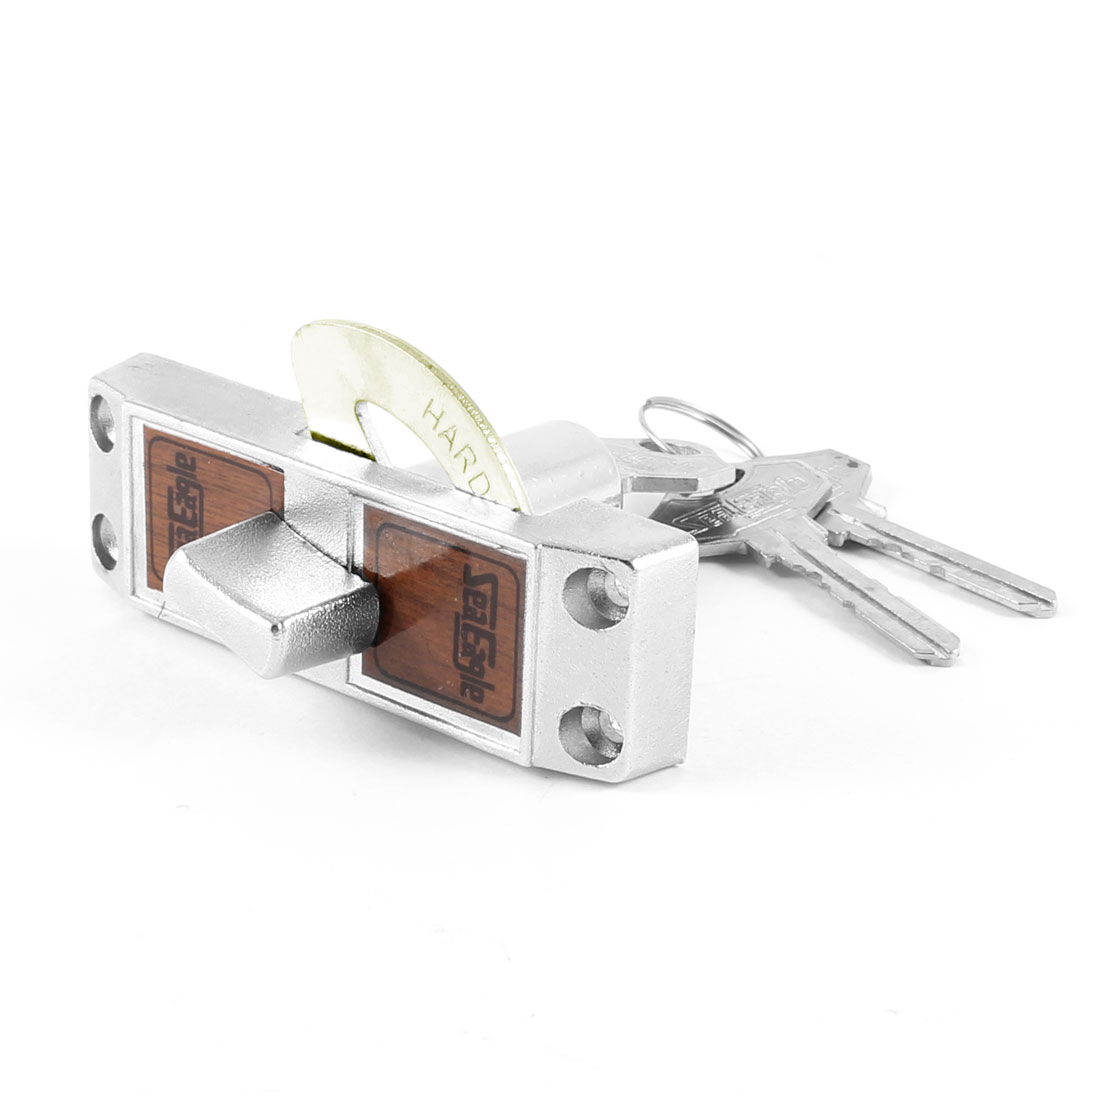 "3.2"" Home Security Aluminium Alloy Cabinet Funiture Door Lock w 3 Keys"